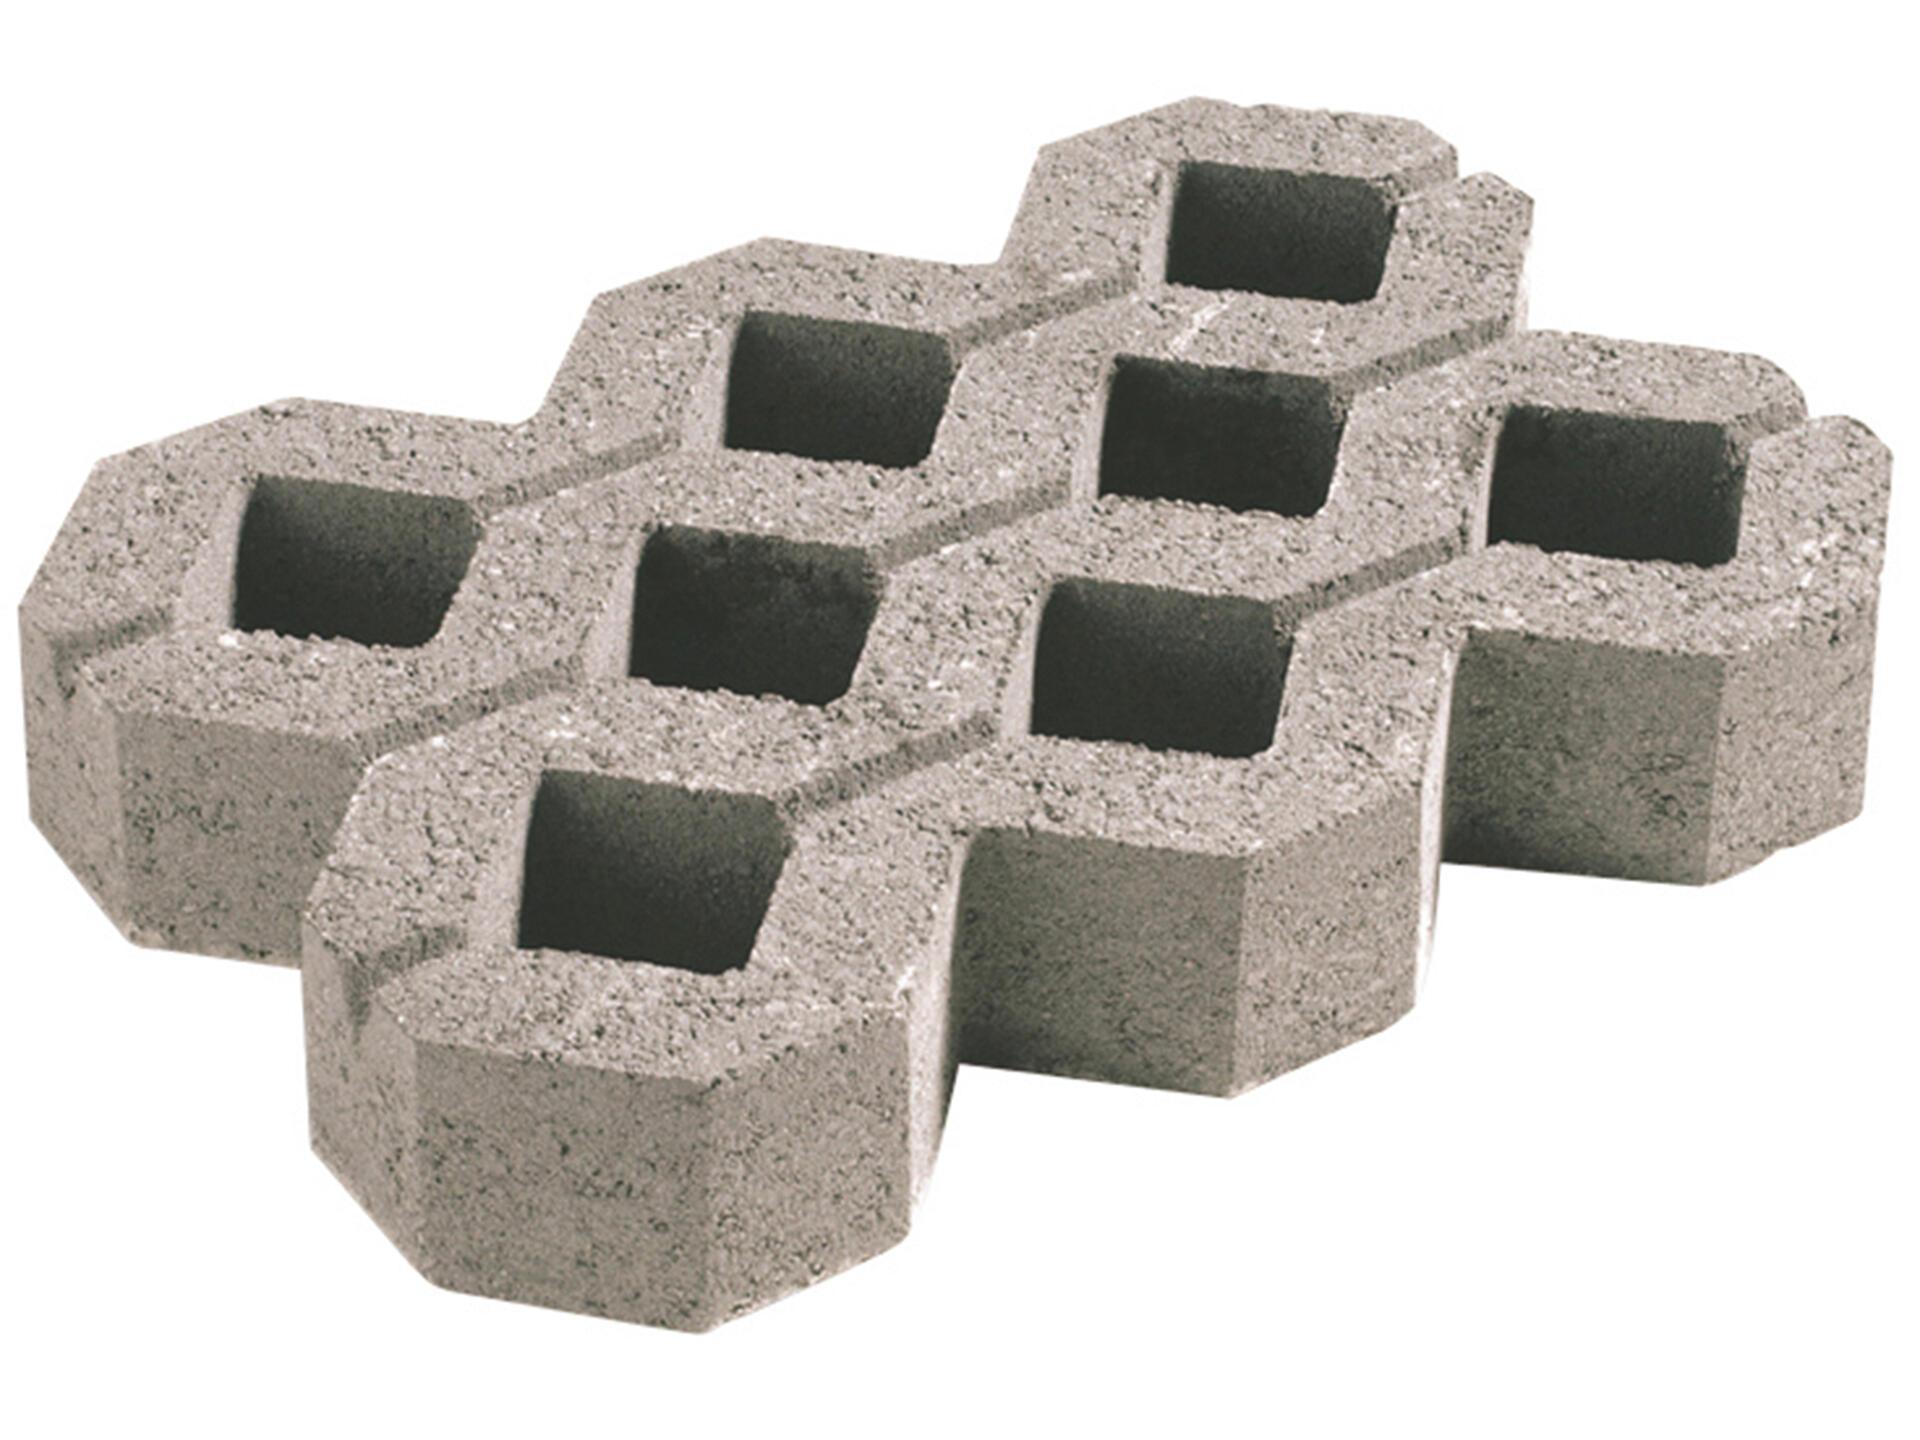 Dalle Beton Parking Herbe dalle gazon 60x40x10 cm 0,24m² béton gris